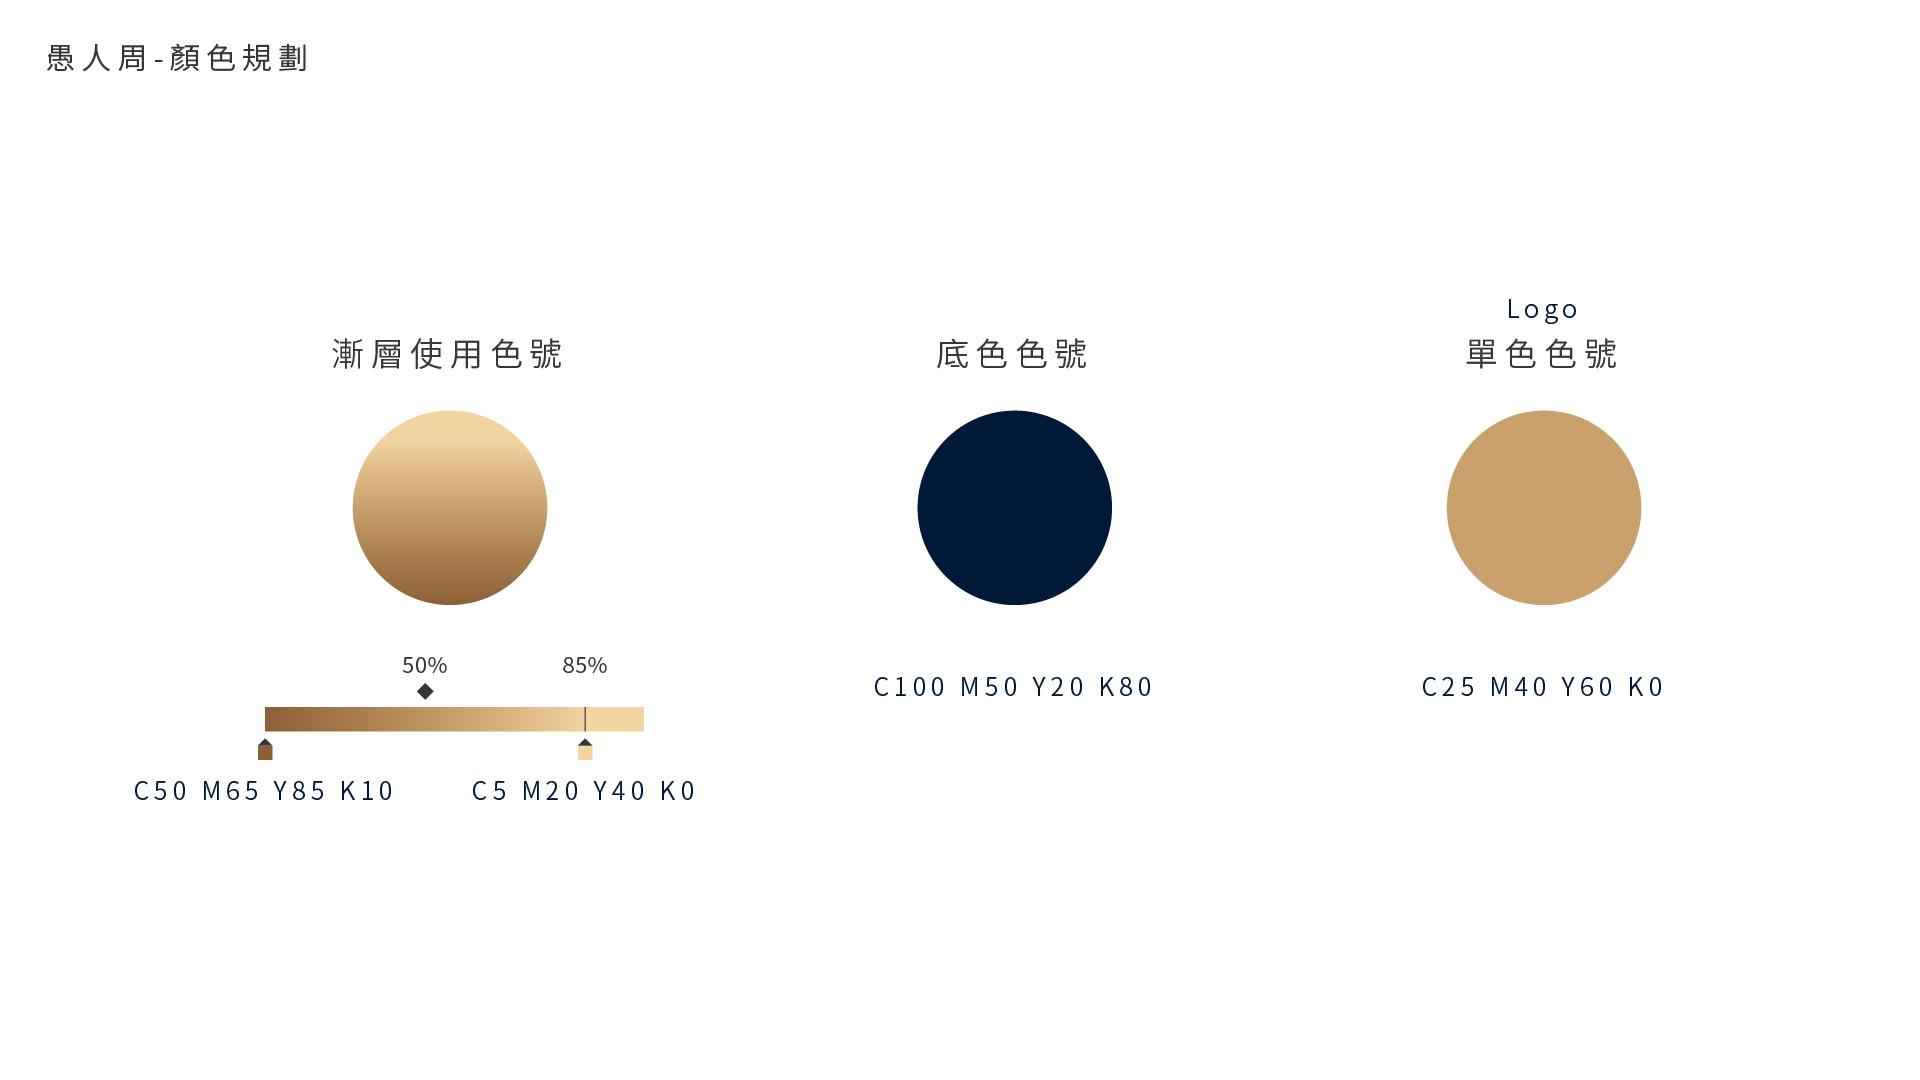 愚人周-Logo-2整-10.jpg